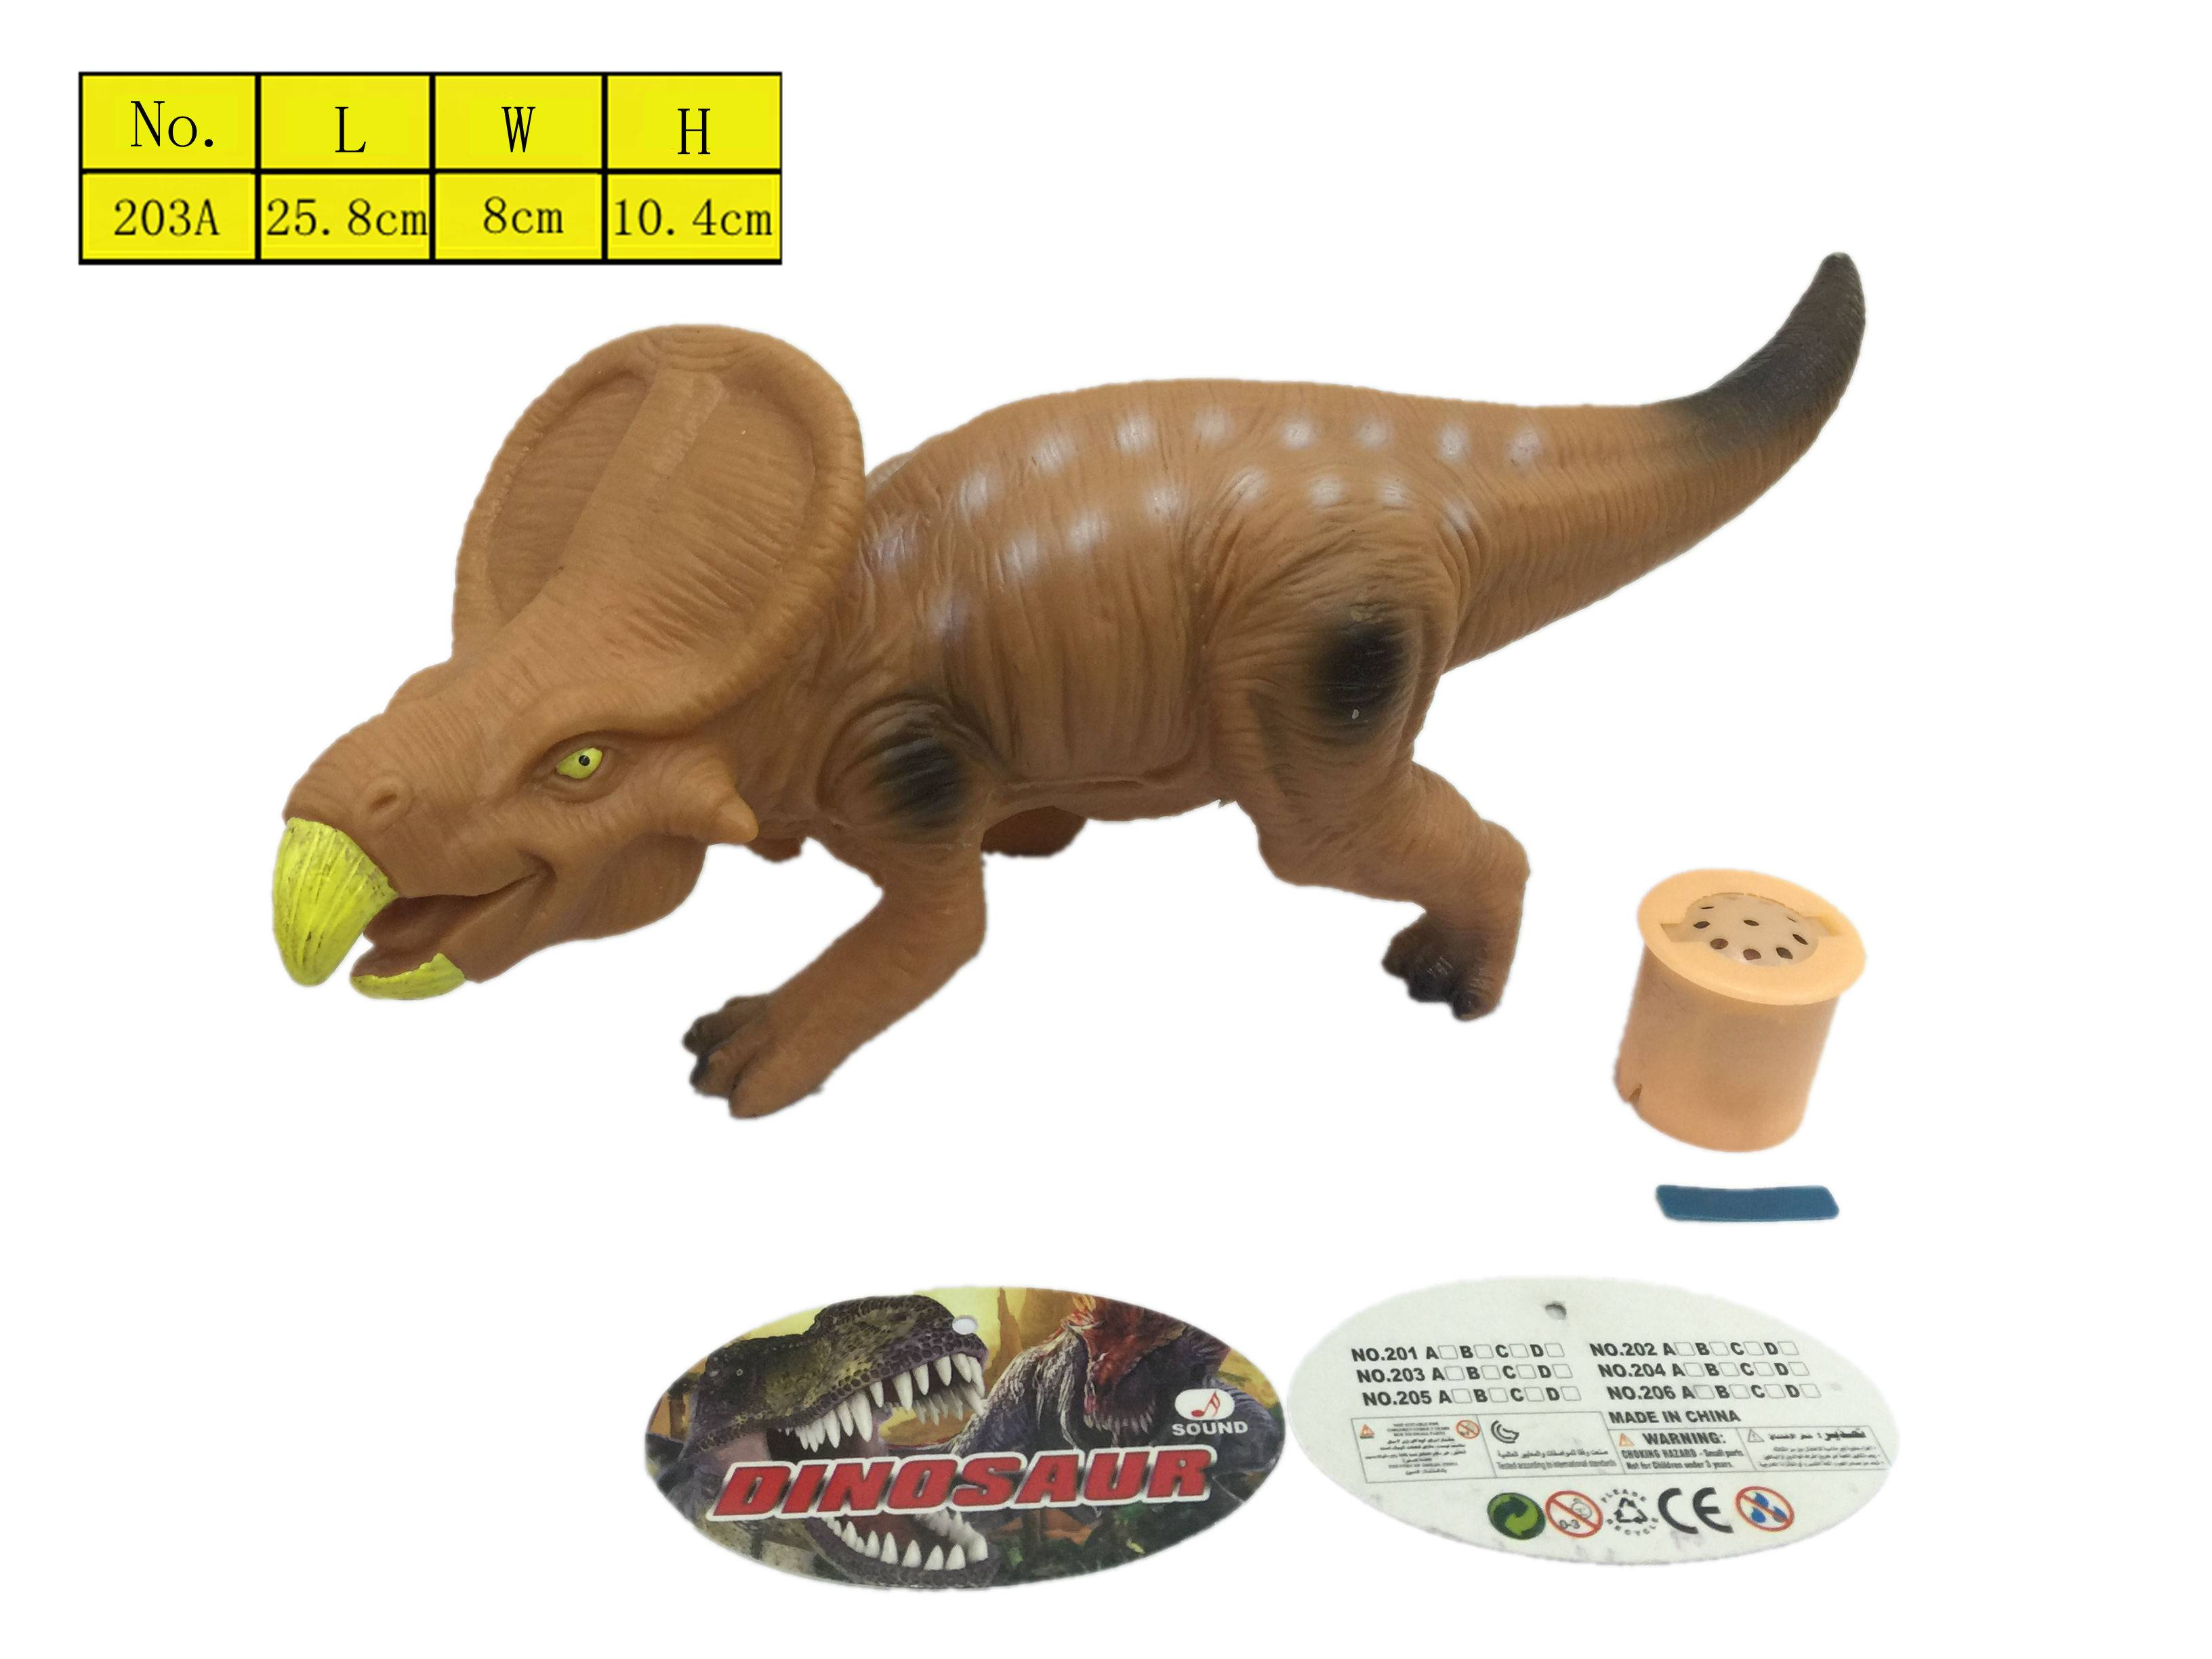 EN71 animals toys Dinosaur model vinyl toys PVC with sound Jurassic Park toys for kids